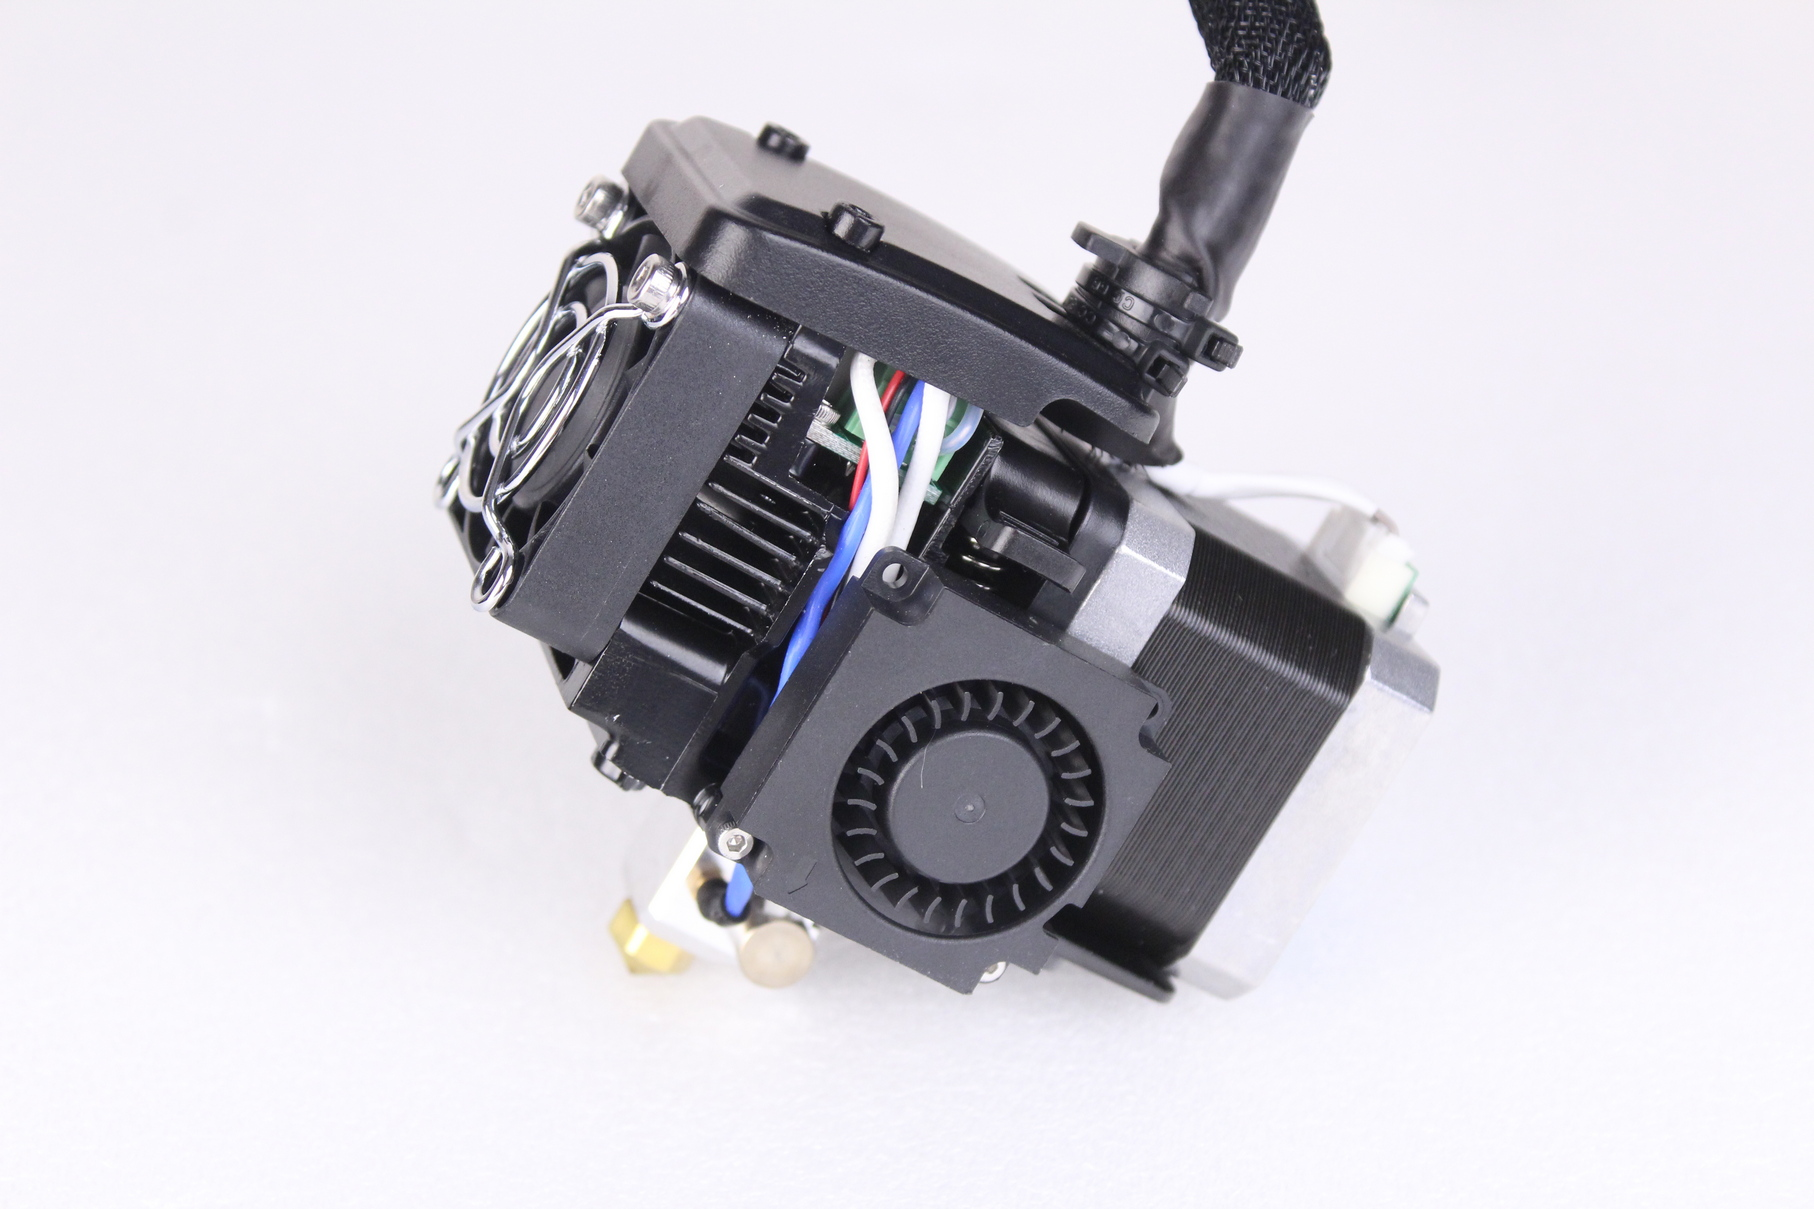 Flashforge-Creator-Pro-2-Direct-Drive-extruders-2